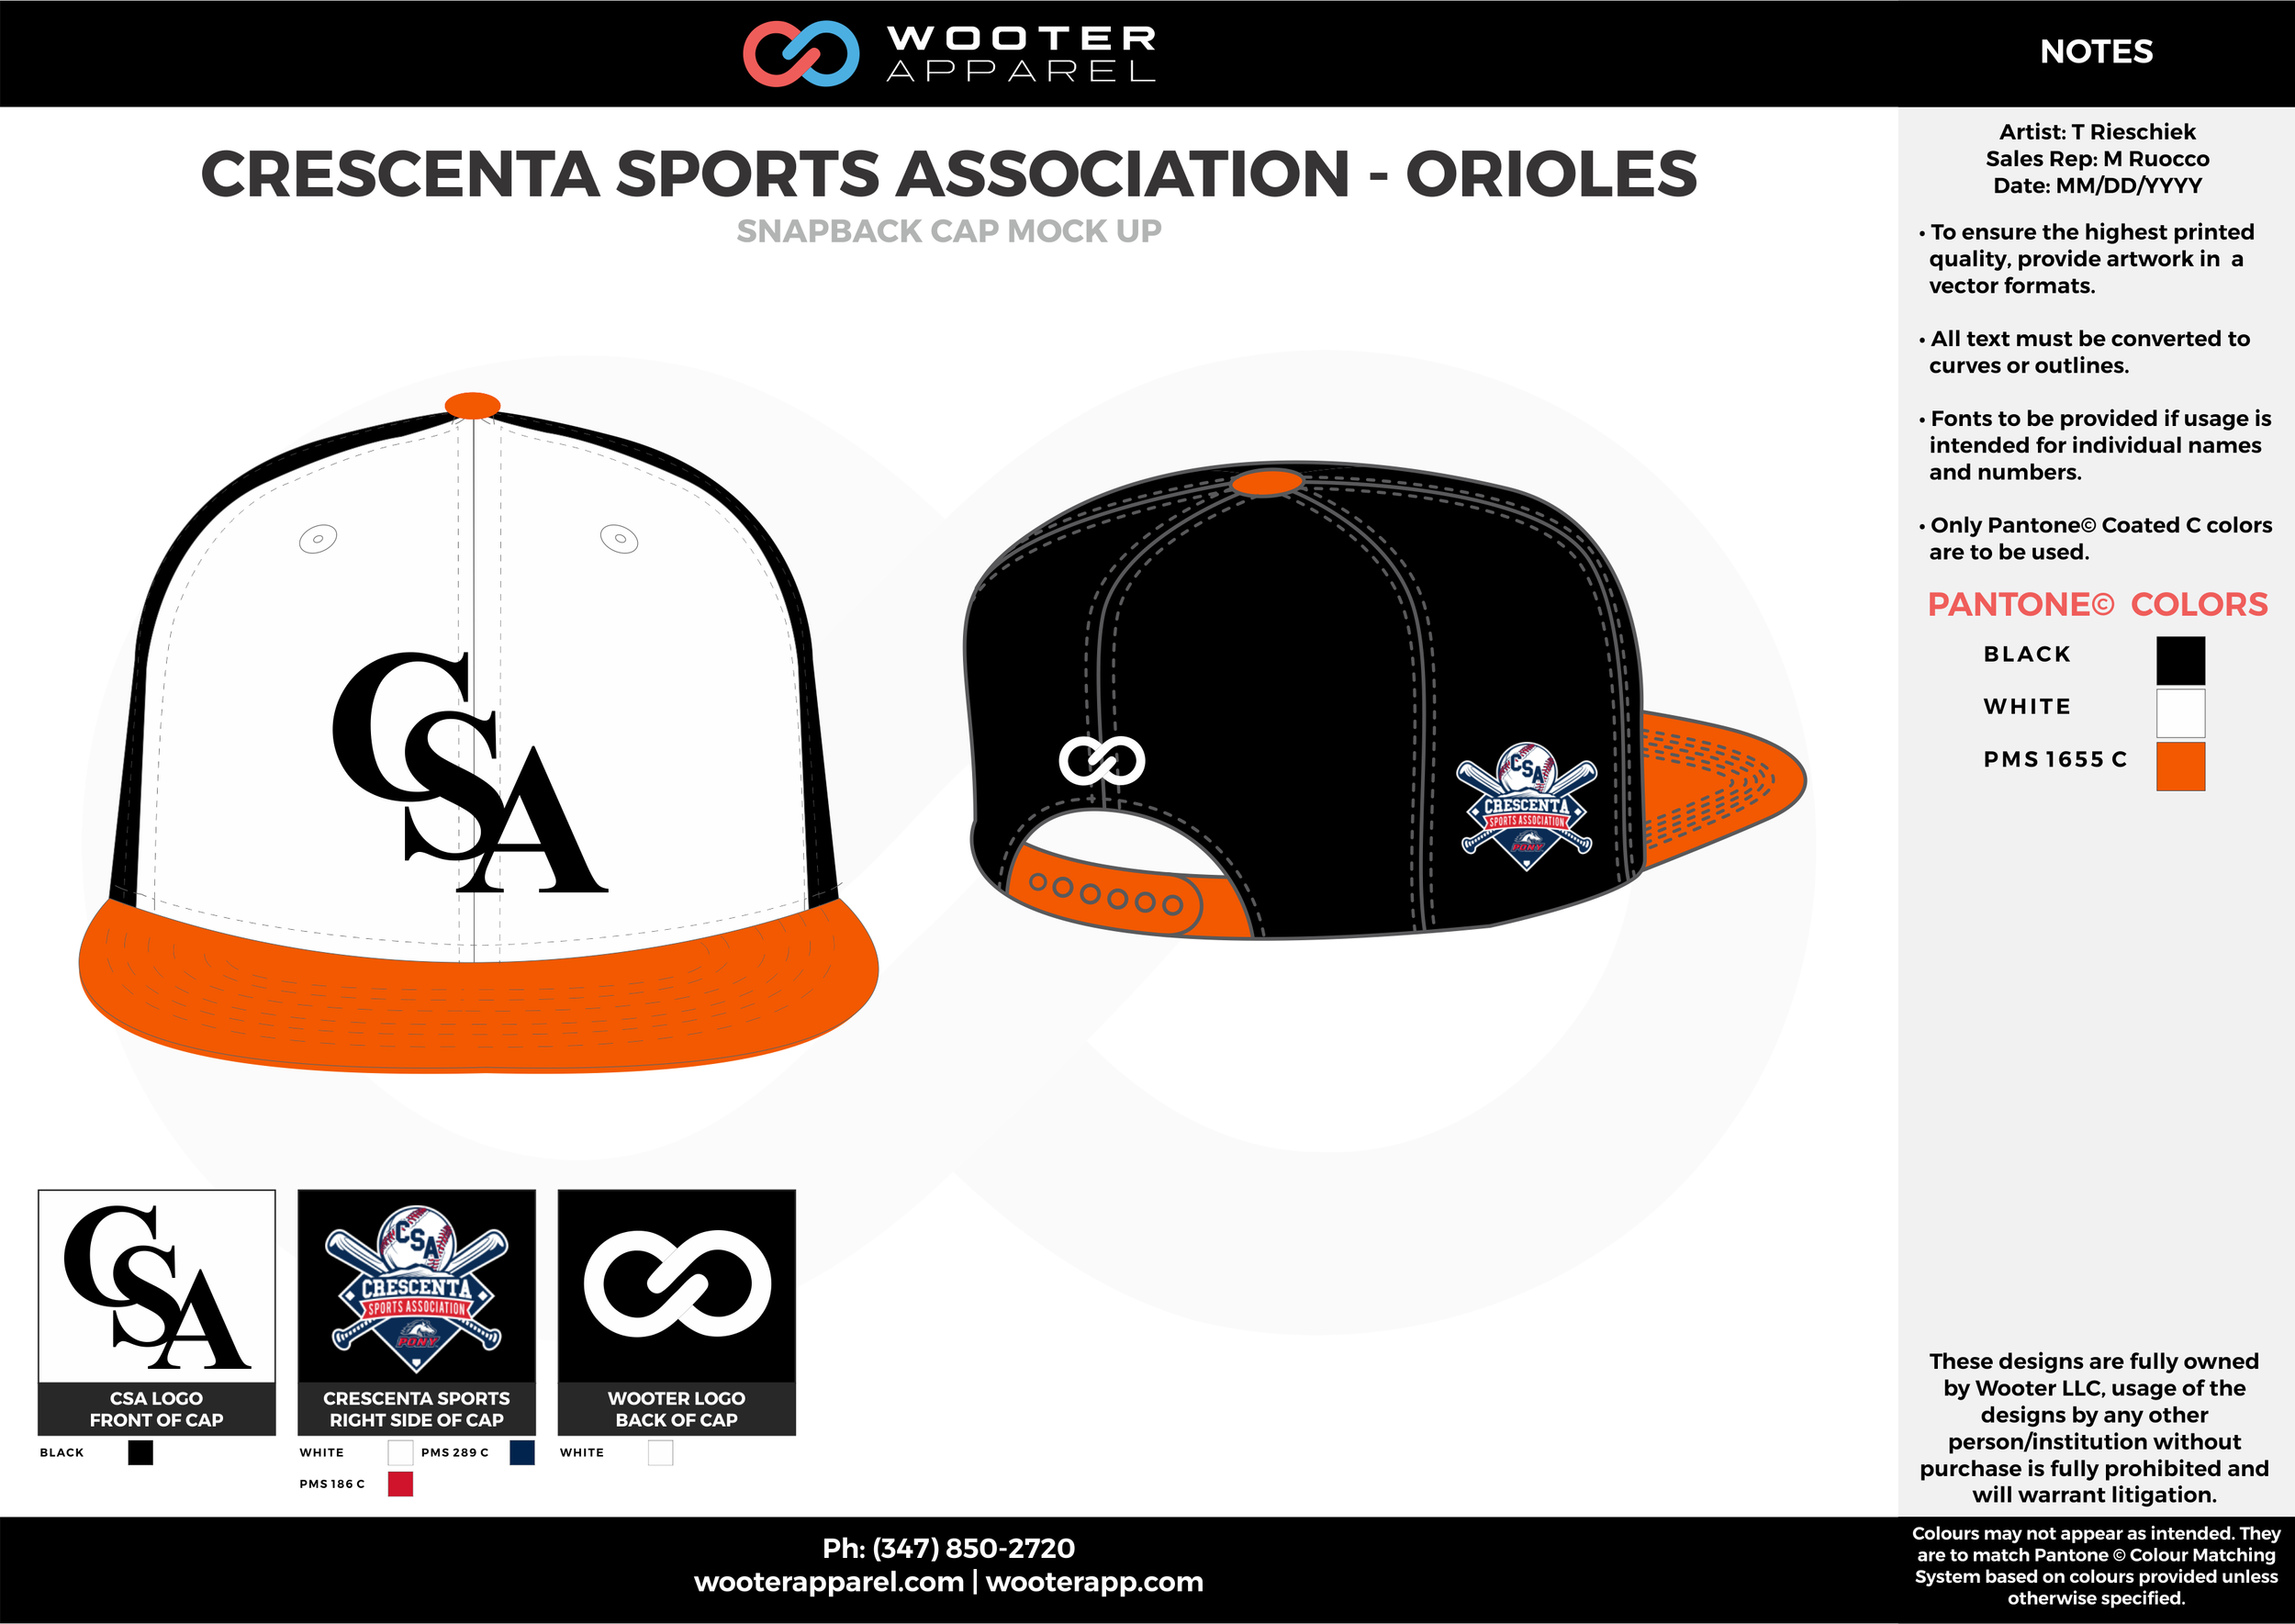 CRESCENTA SPORTS ASSOCIATION - ORIOLES Black White and Orange Basketball Snapback Hat and Cap